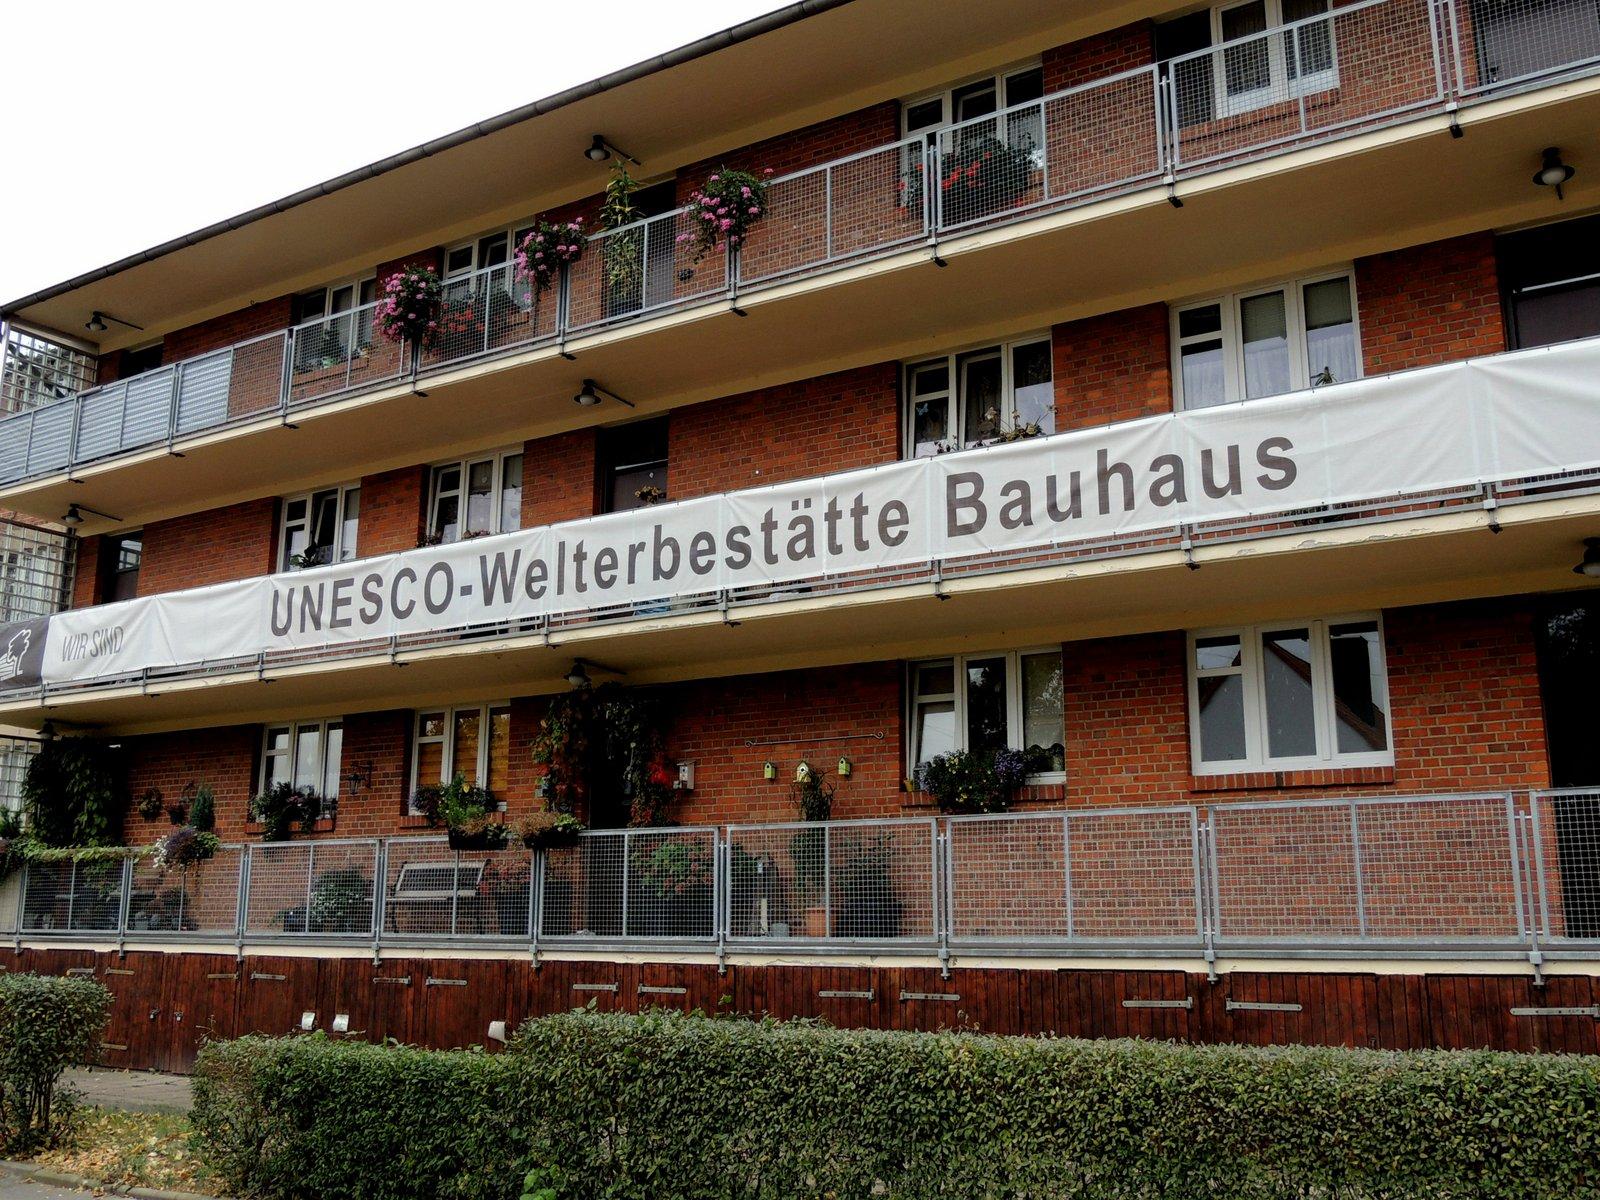 Bauhaus Laubenganghäuser Dessau-Törten